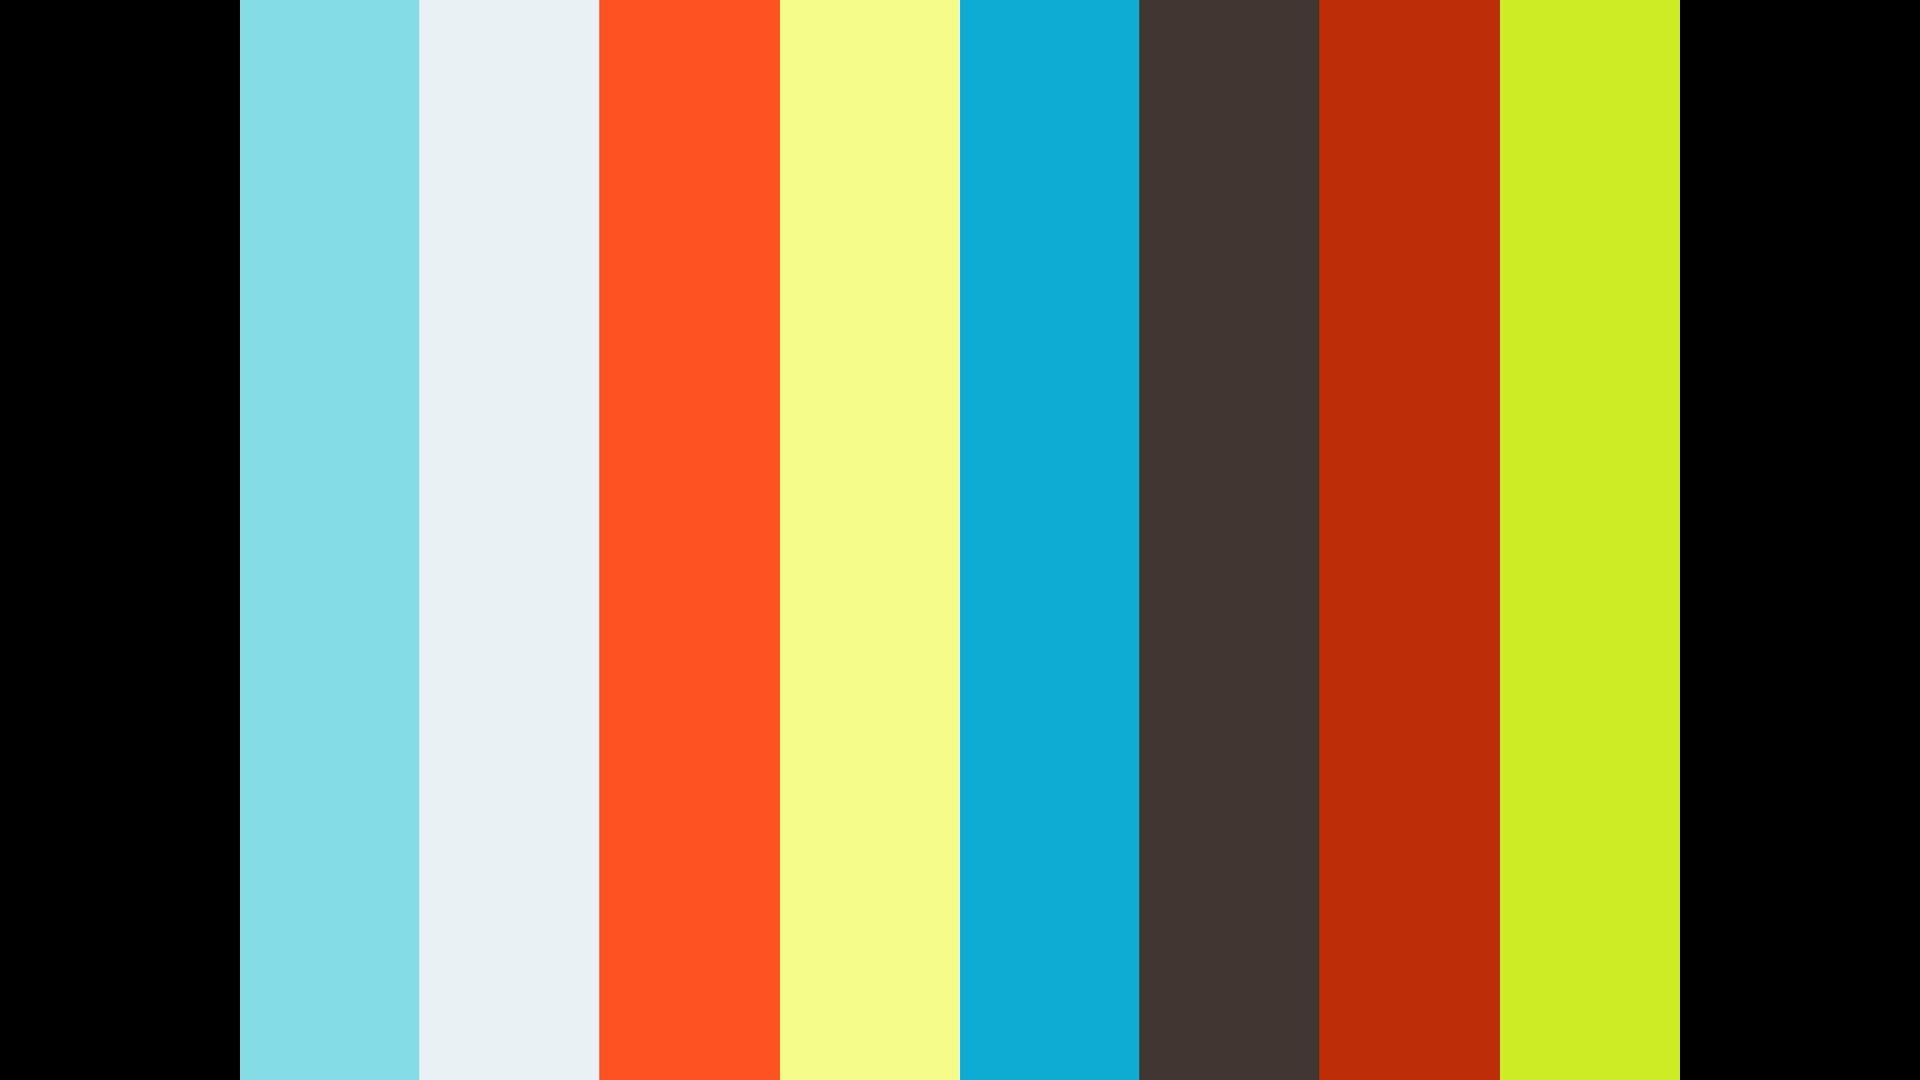 Energiedirect, styled by Inge de Lange